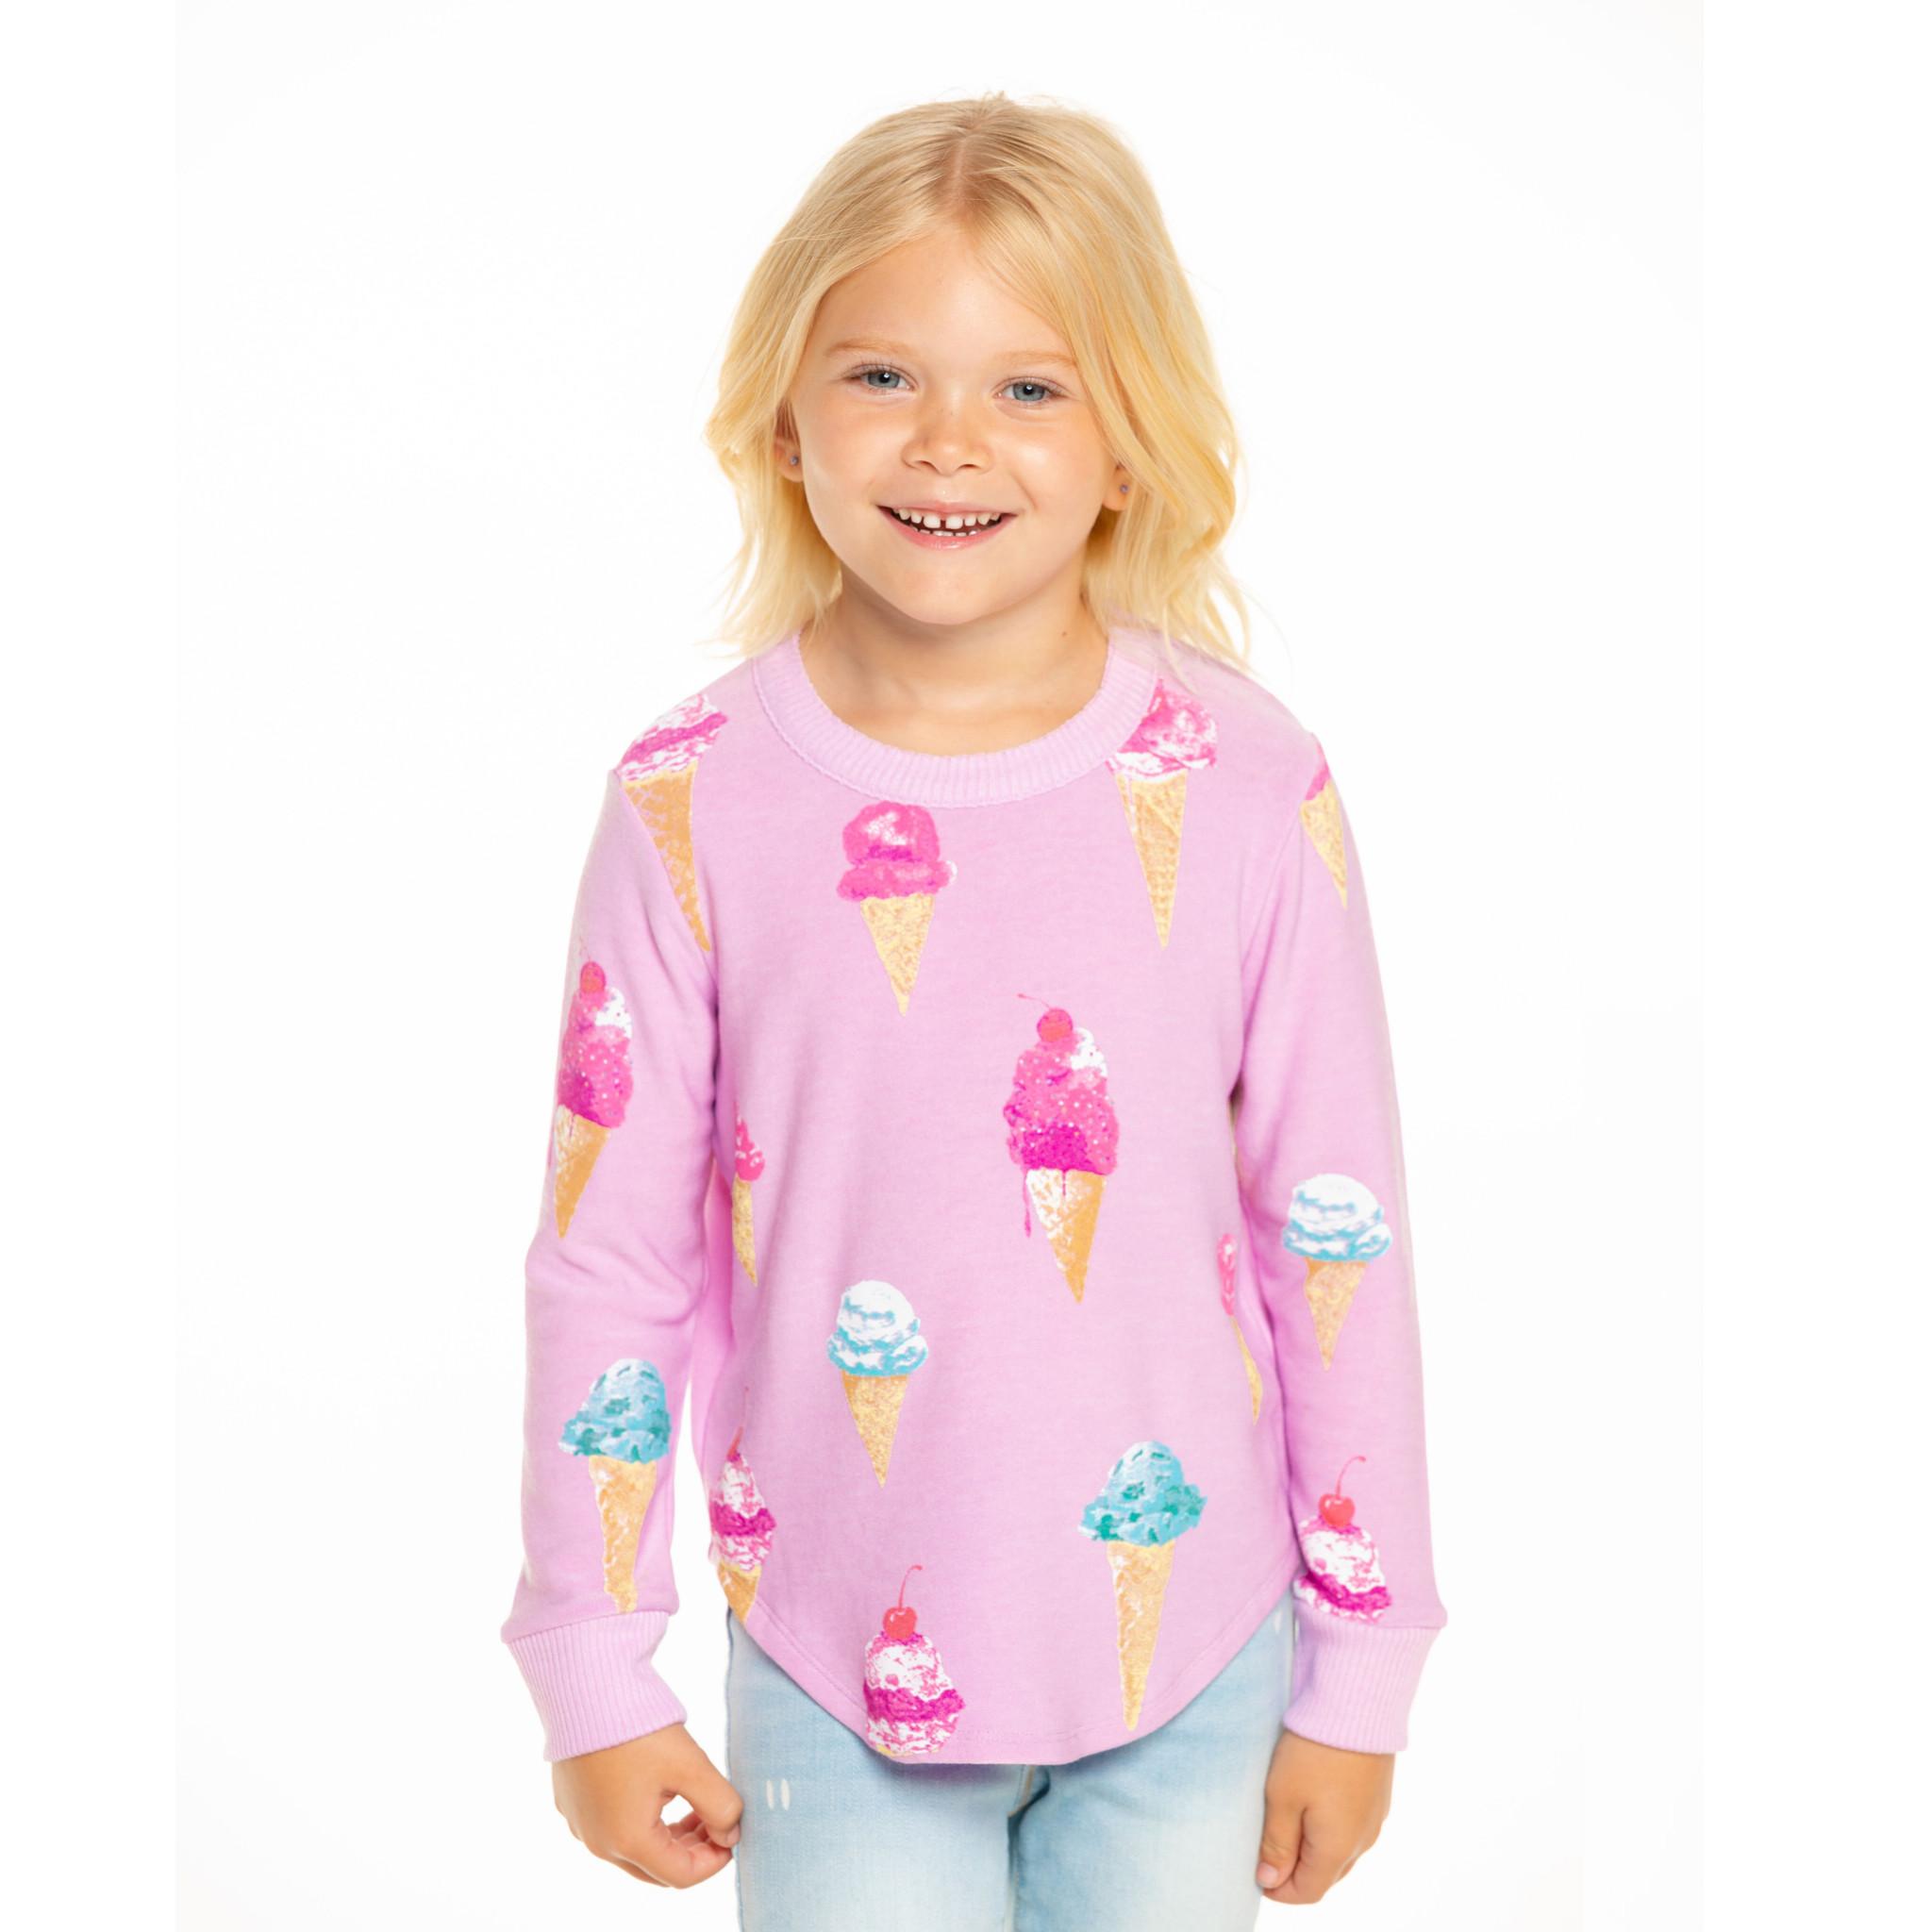 Chaser Yummy Cones Sweatshirt